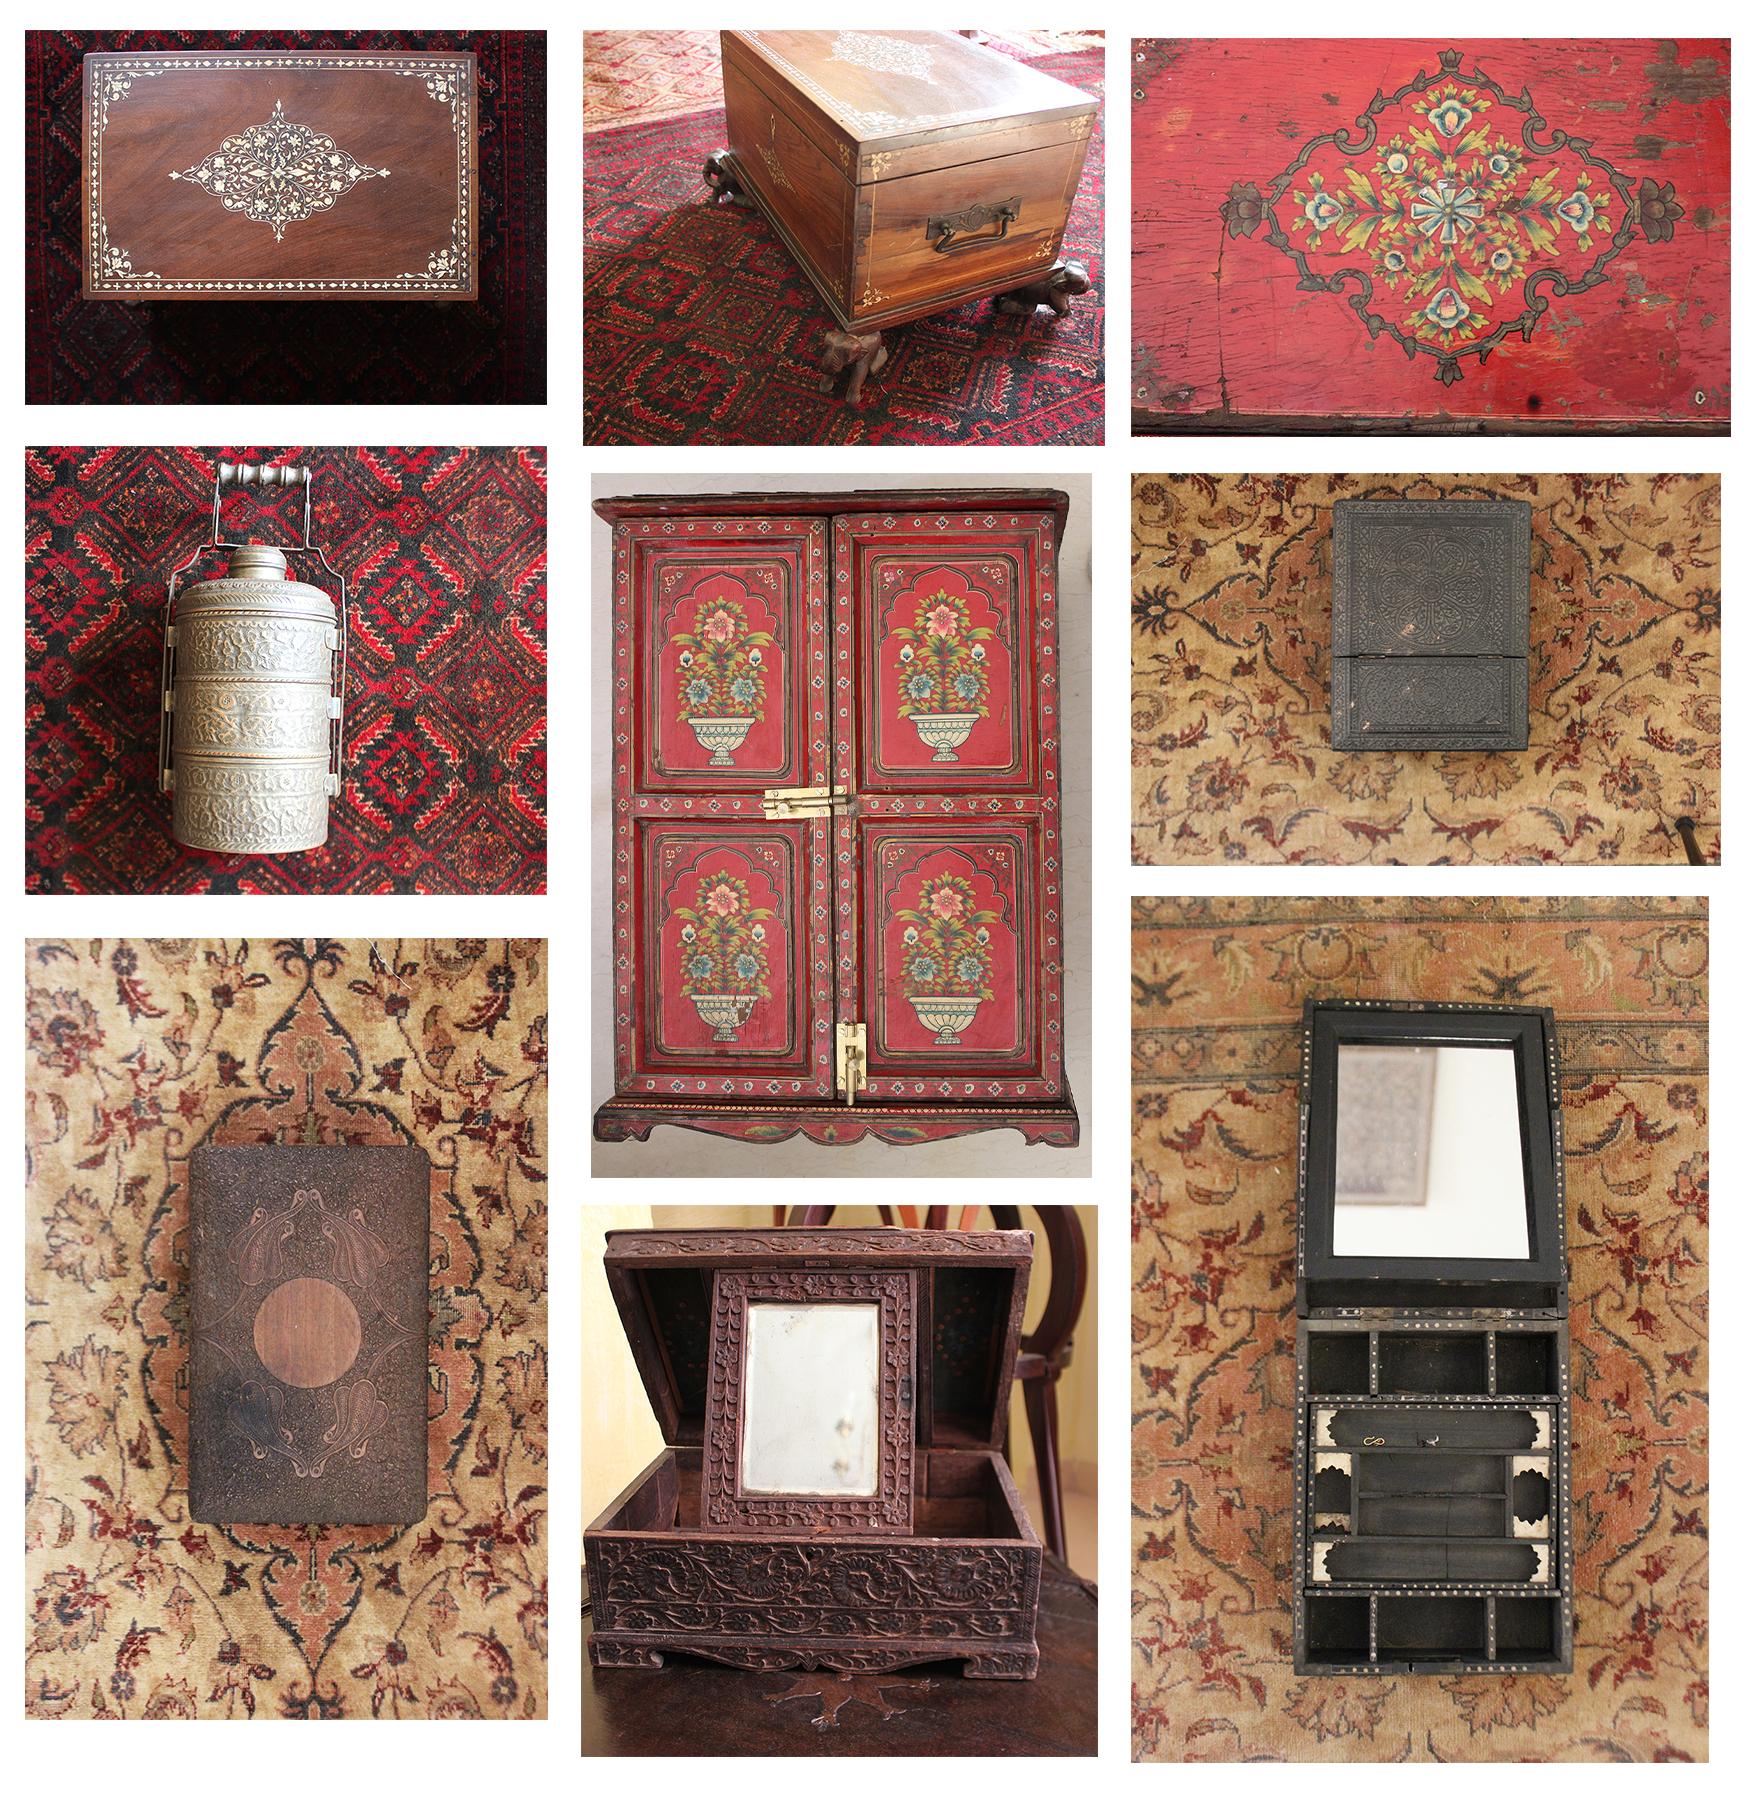 indian boxes, hand made, carved, inlaid, indian handicrafts, elegant style, shivani dogra, interior design, gurgaon